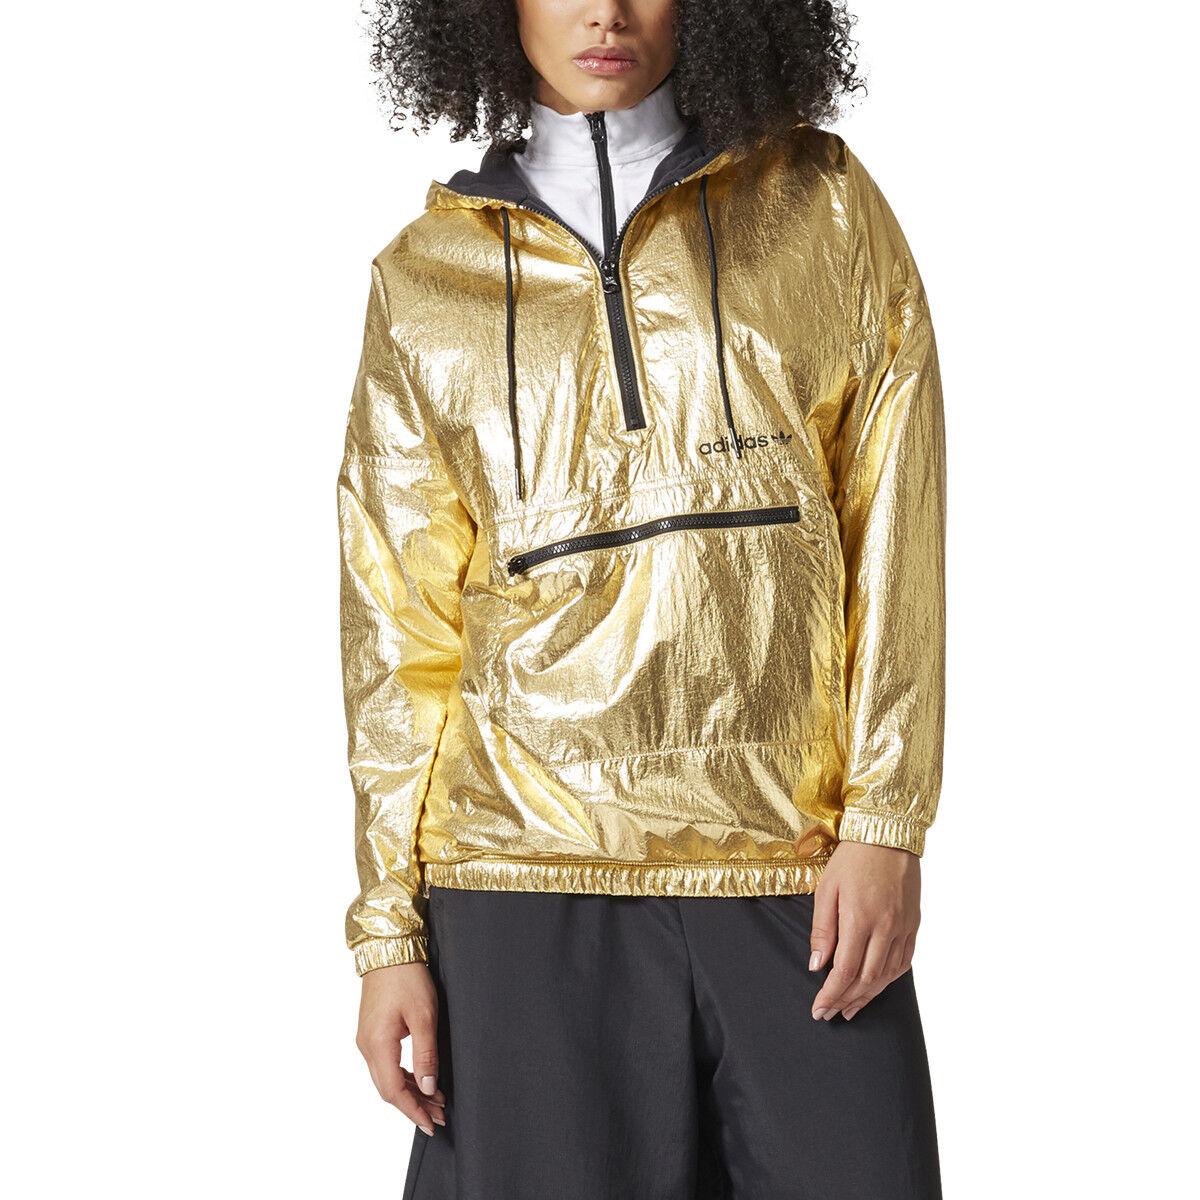 Adidas Originals Windbreaker női dzseki arany / fekete br0290